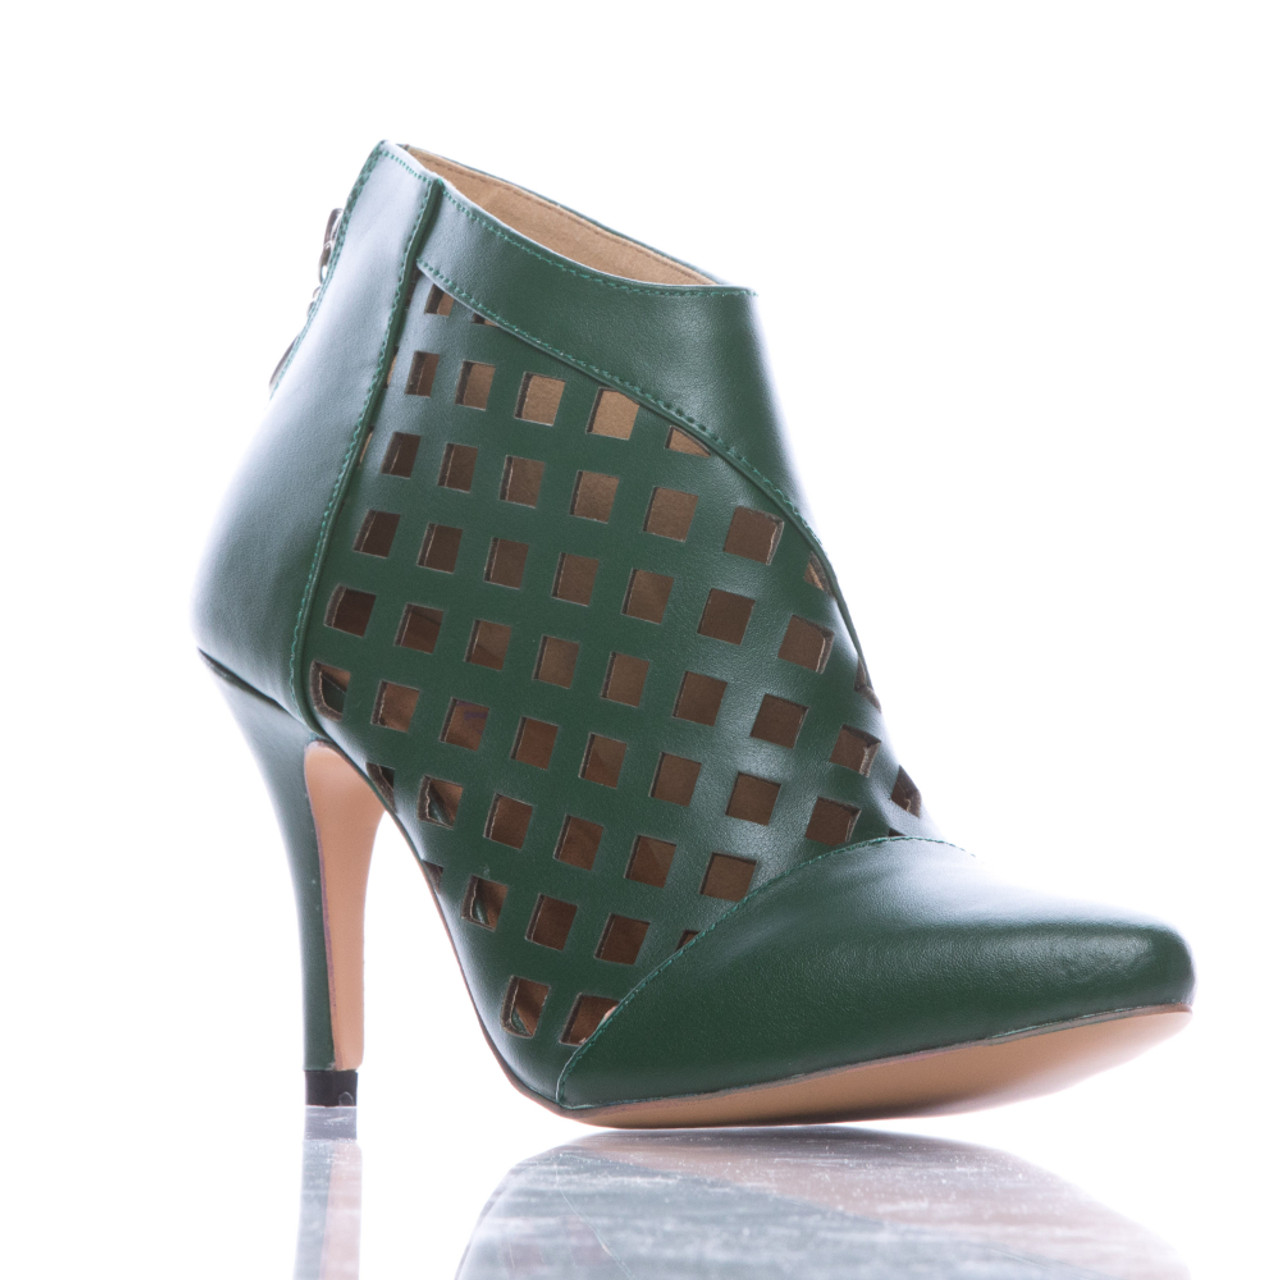 965d514a8775 Melissa Mitro - Dark Green Pointed Toe Cutout Stiletto Bootie - 3.5 inch  Heels - Burju Shoes